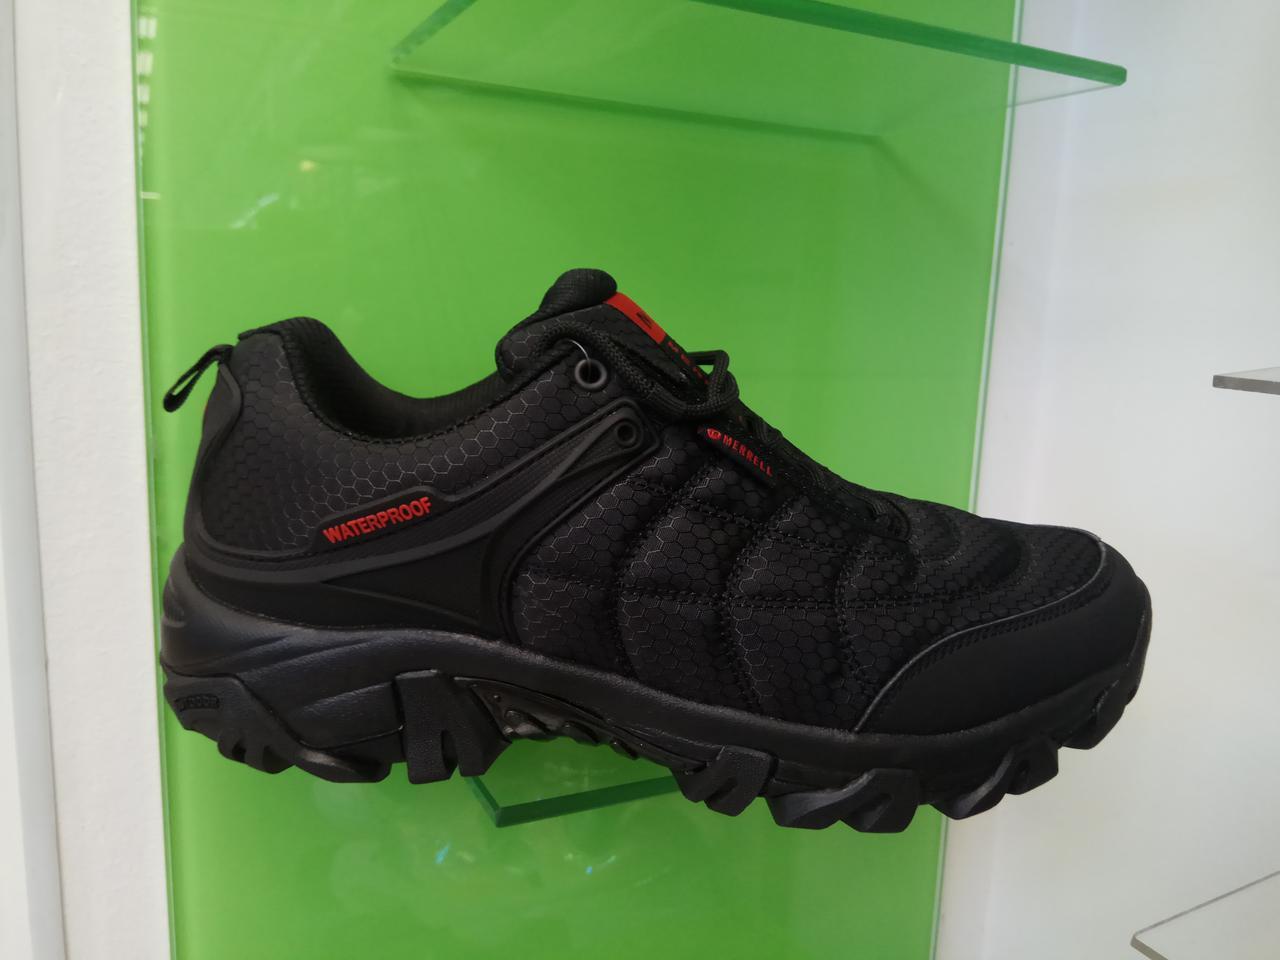 Кроссовки Merrell Ice Cap Moc II black  продажа 59872c0a0b100